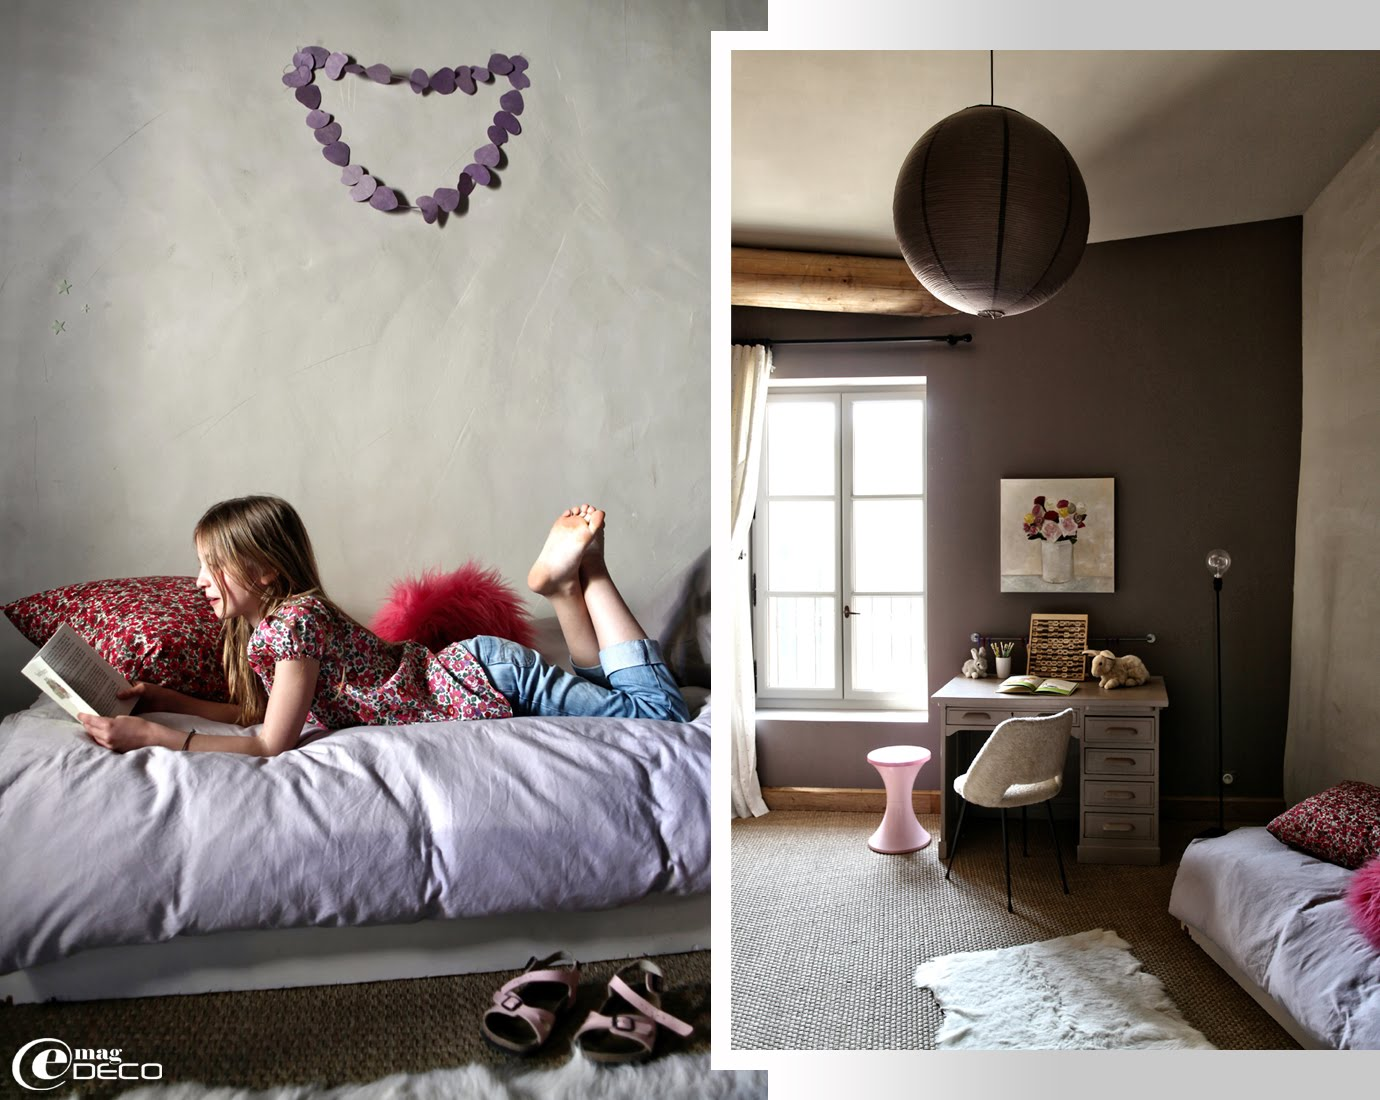 attic works january 2013. Black Bedroom Furniture Sets. Home Design Ideas